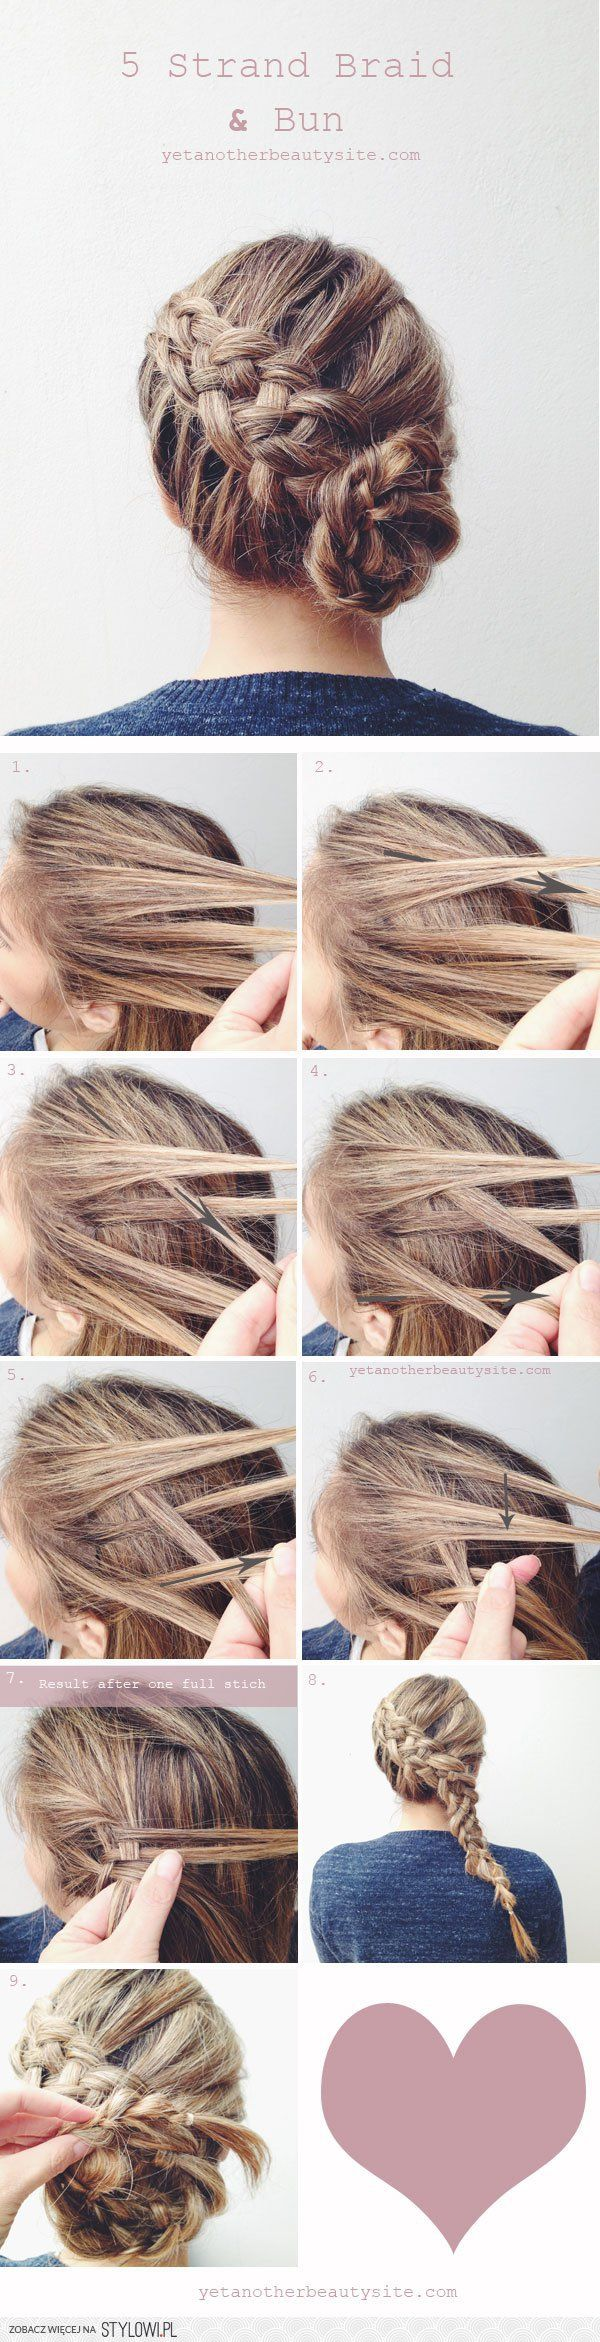 Yet another beauty site saç modeli fikirleri pinterest braided